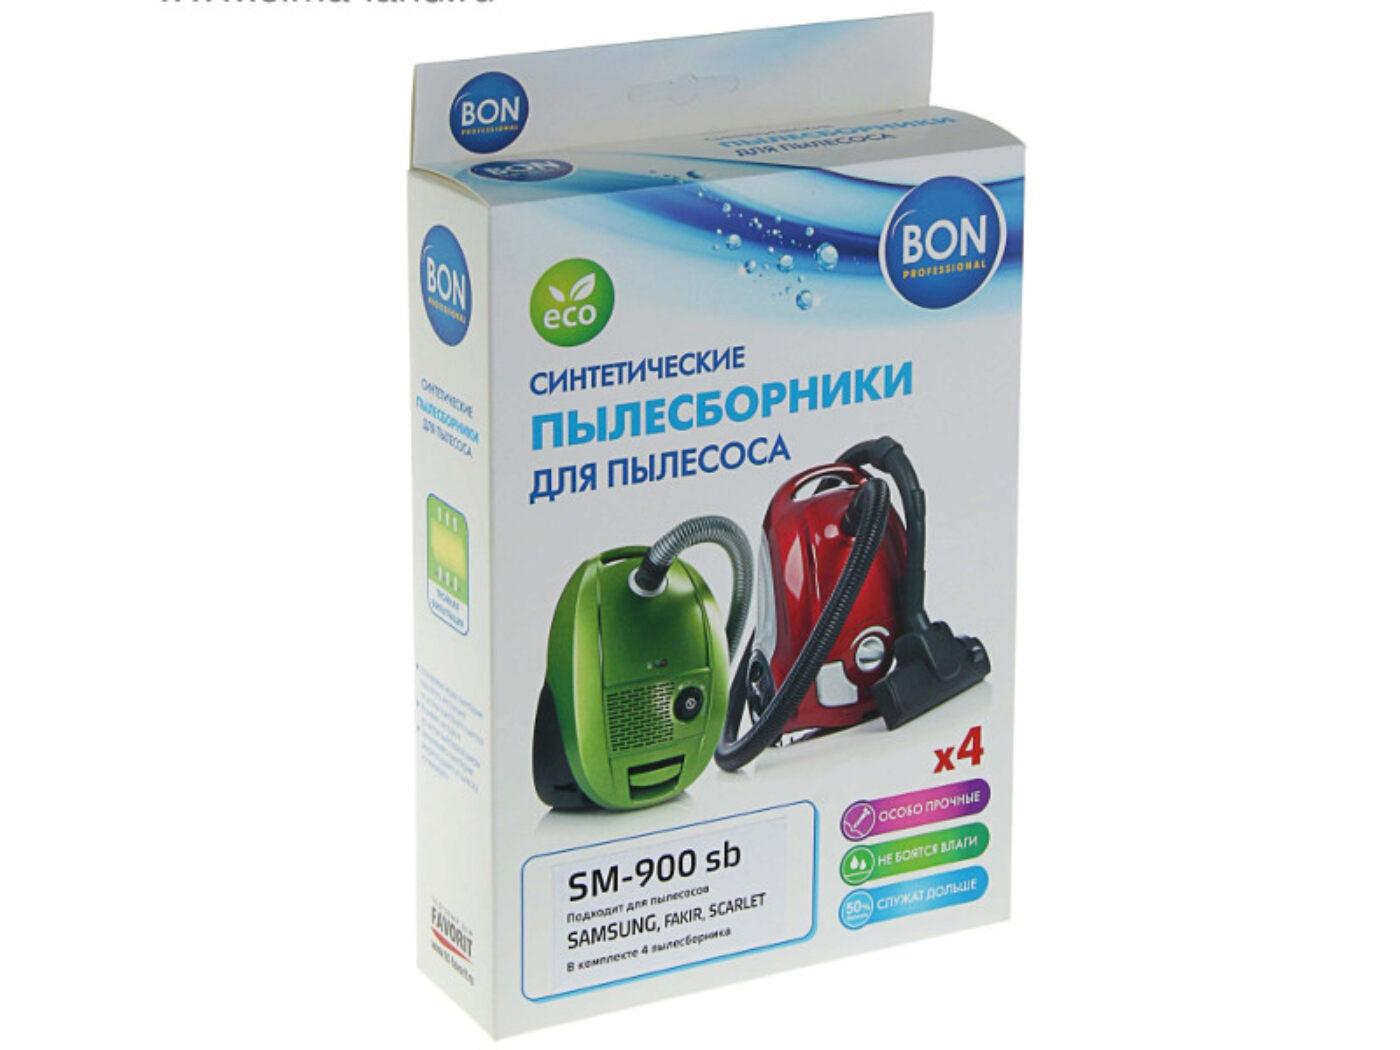 Tozsoran torbası  (Electrolux,Philips,Zanussi) BON SM-900 sb  - 1